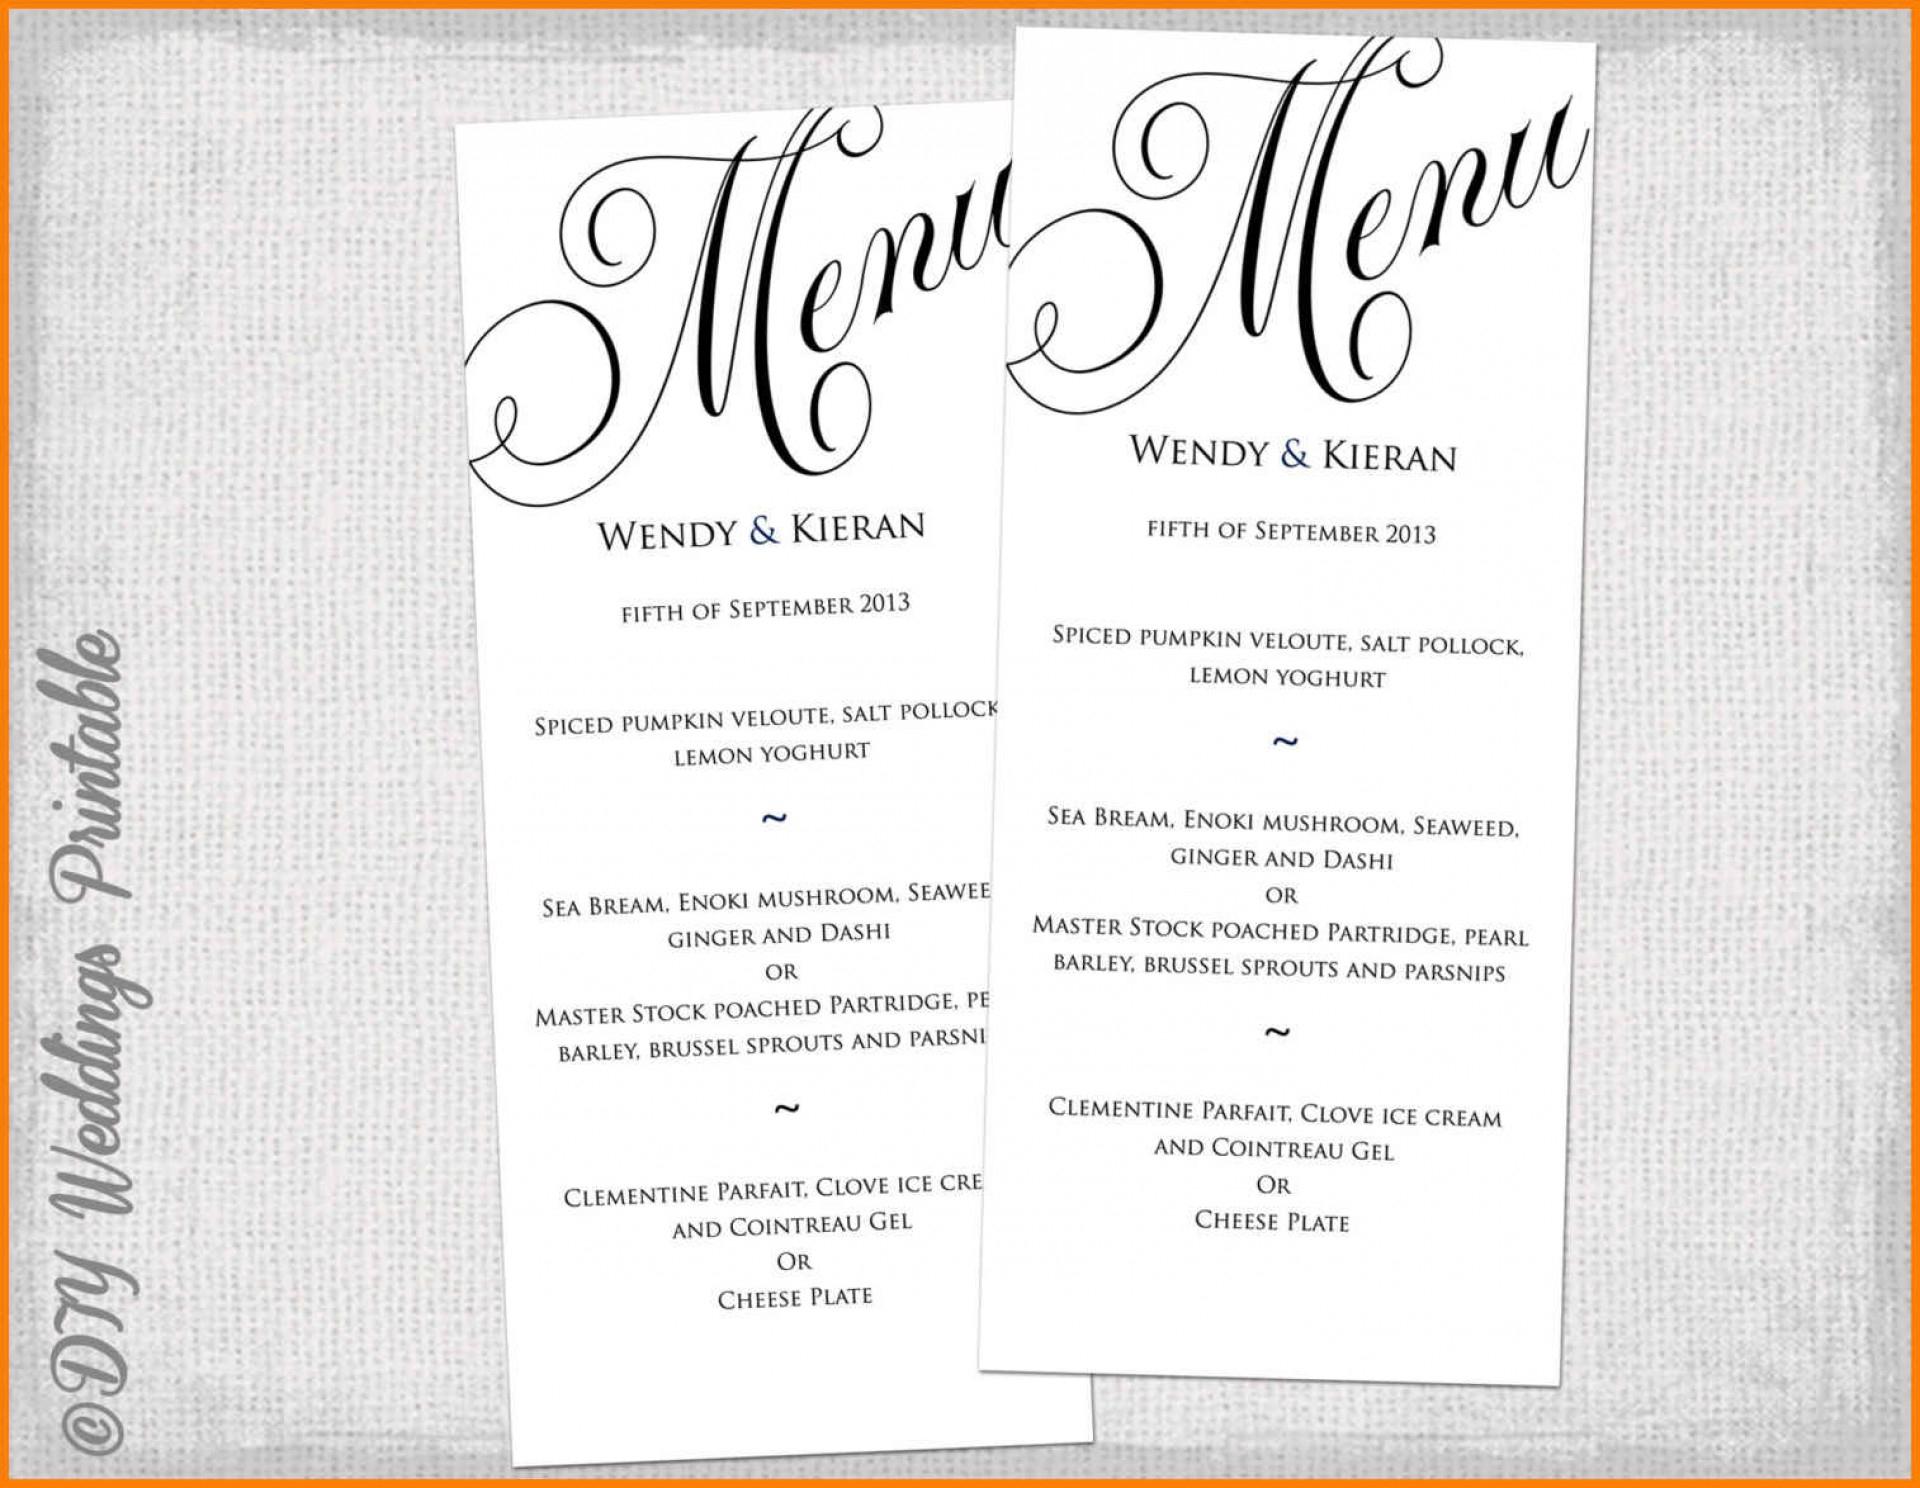 002 Template Ideas Dinner Party Menu 8 Best Images Of Printable - Free Printable Dinner Party Menu Template